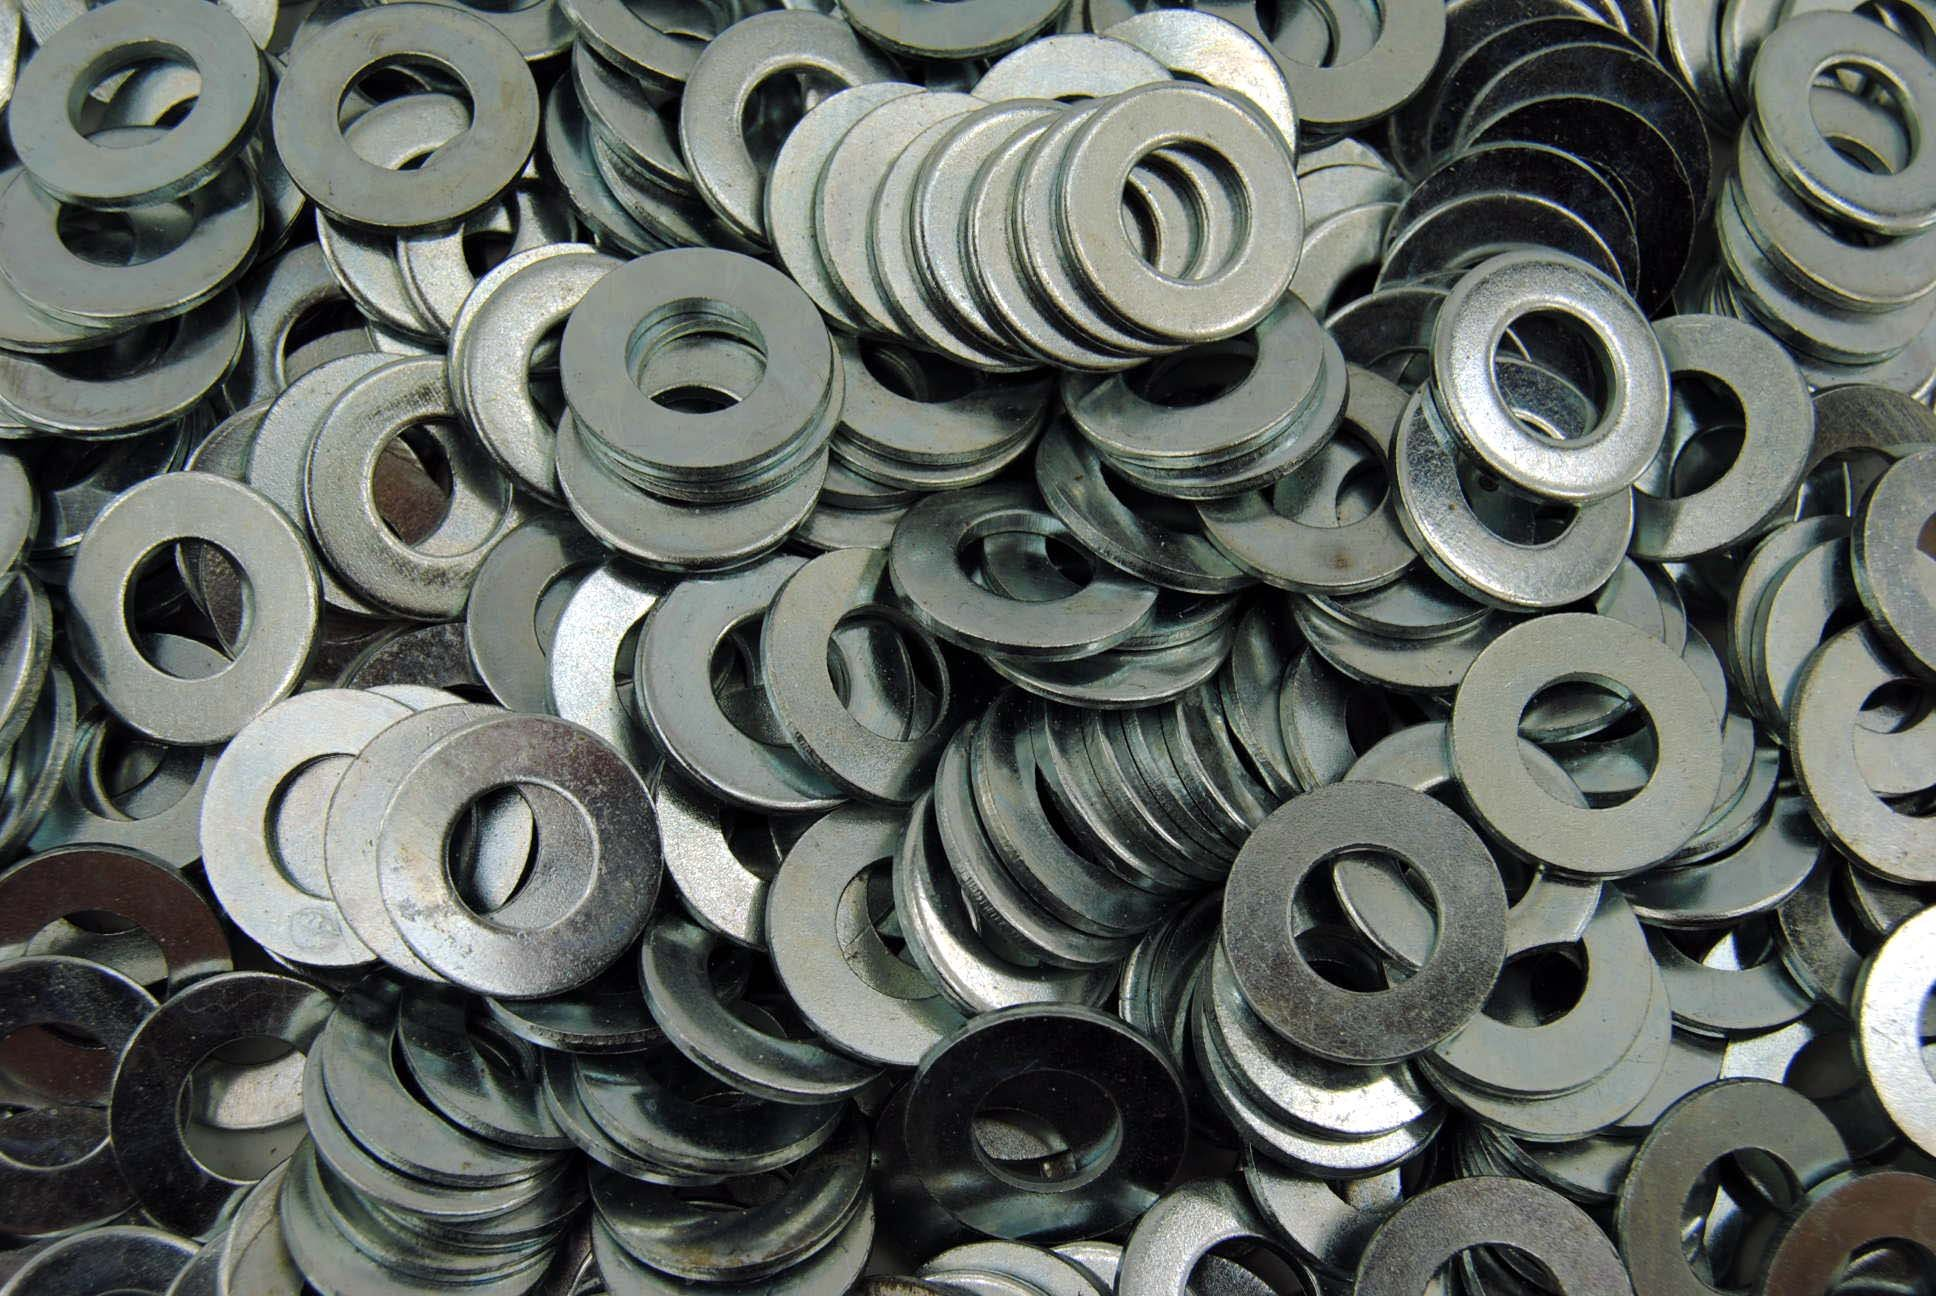 50 Lb Box 3/8 SAE Flat Washer - Zinc Plated - Approx. 7,000 pcs Bulk